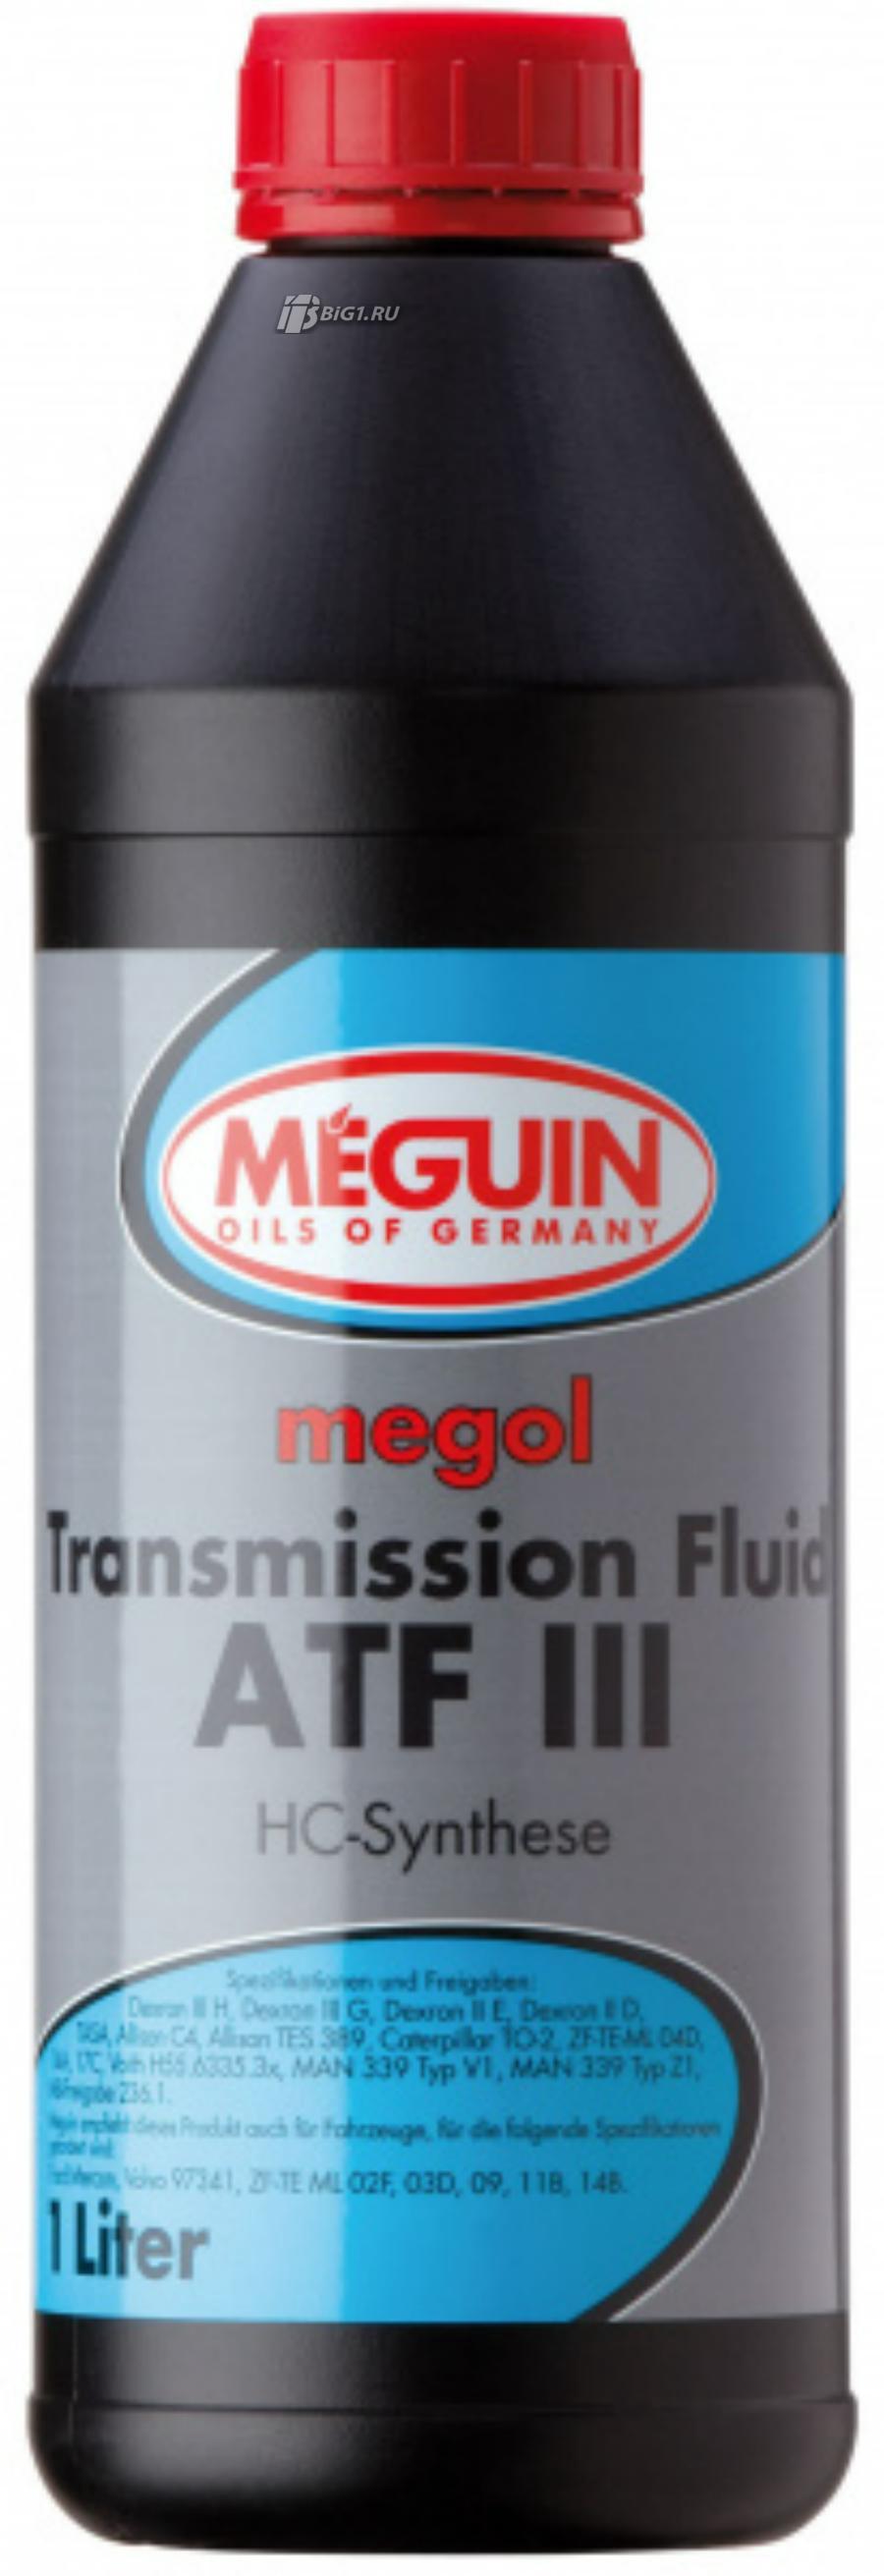 MEGUIN Transmission Fluid ATF III